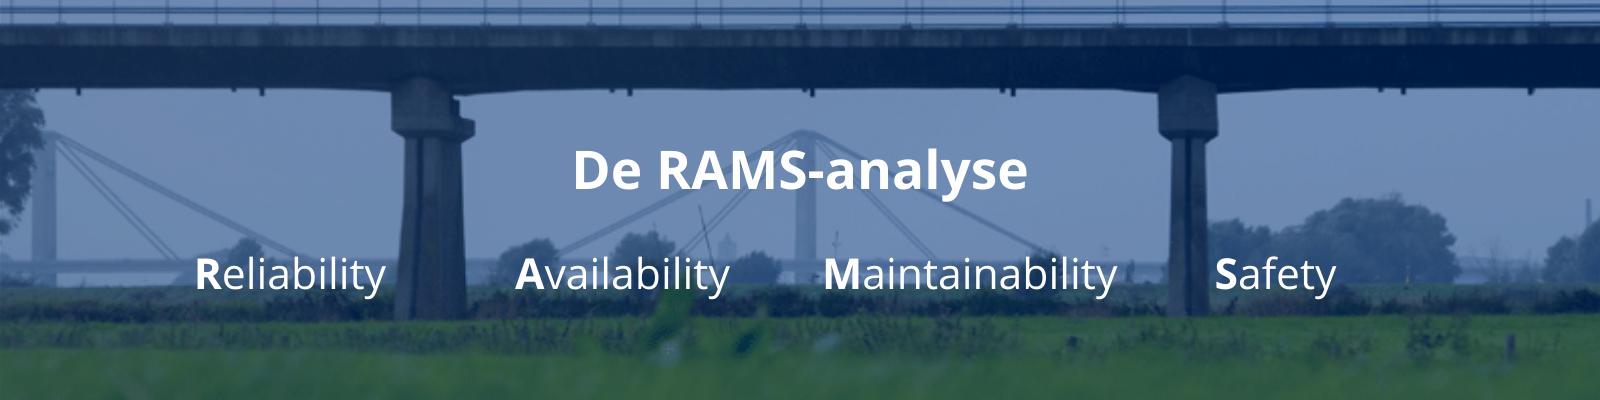 RAMS-analyse